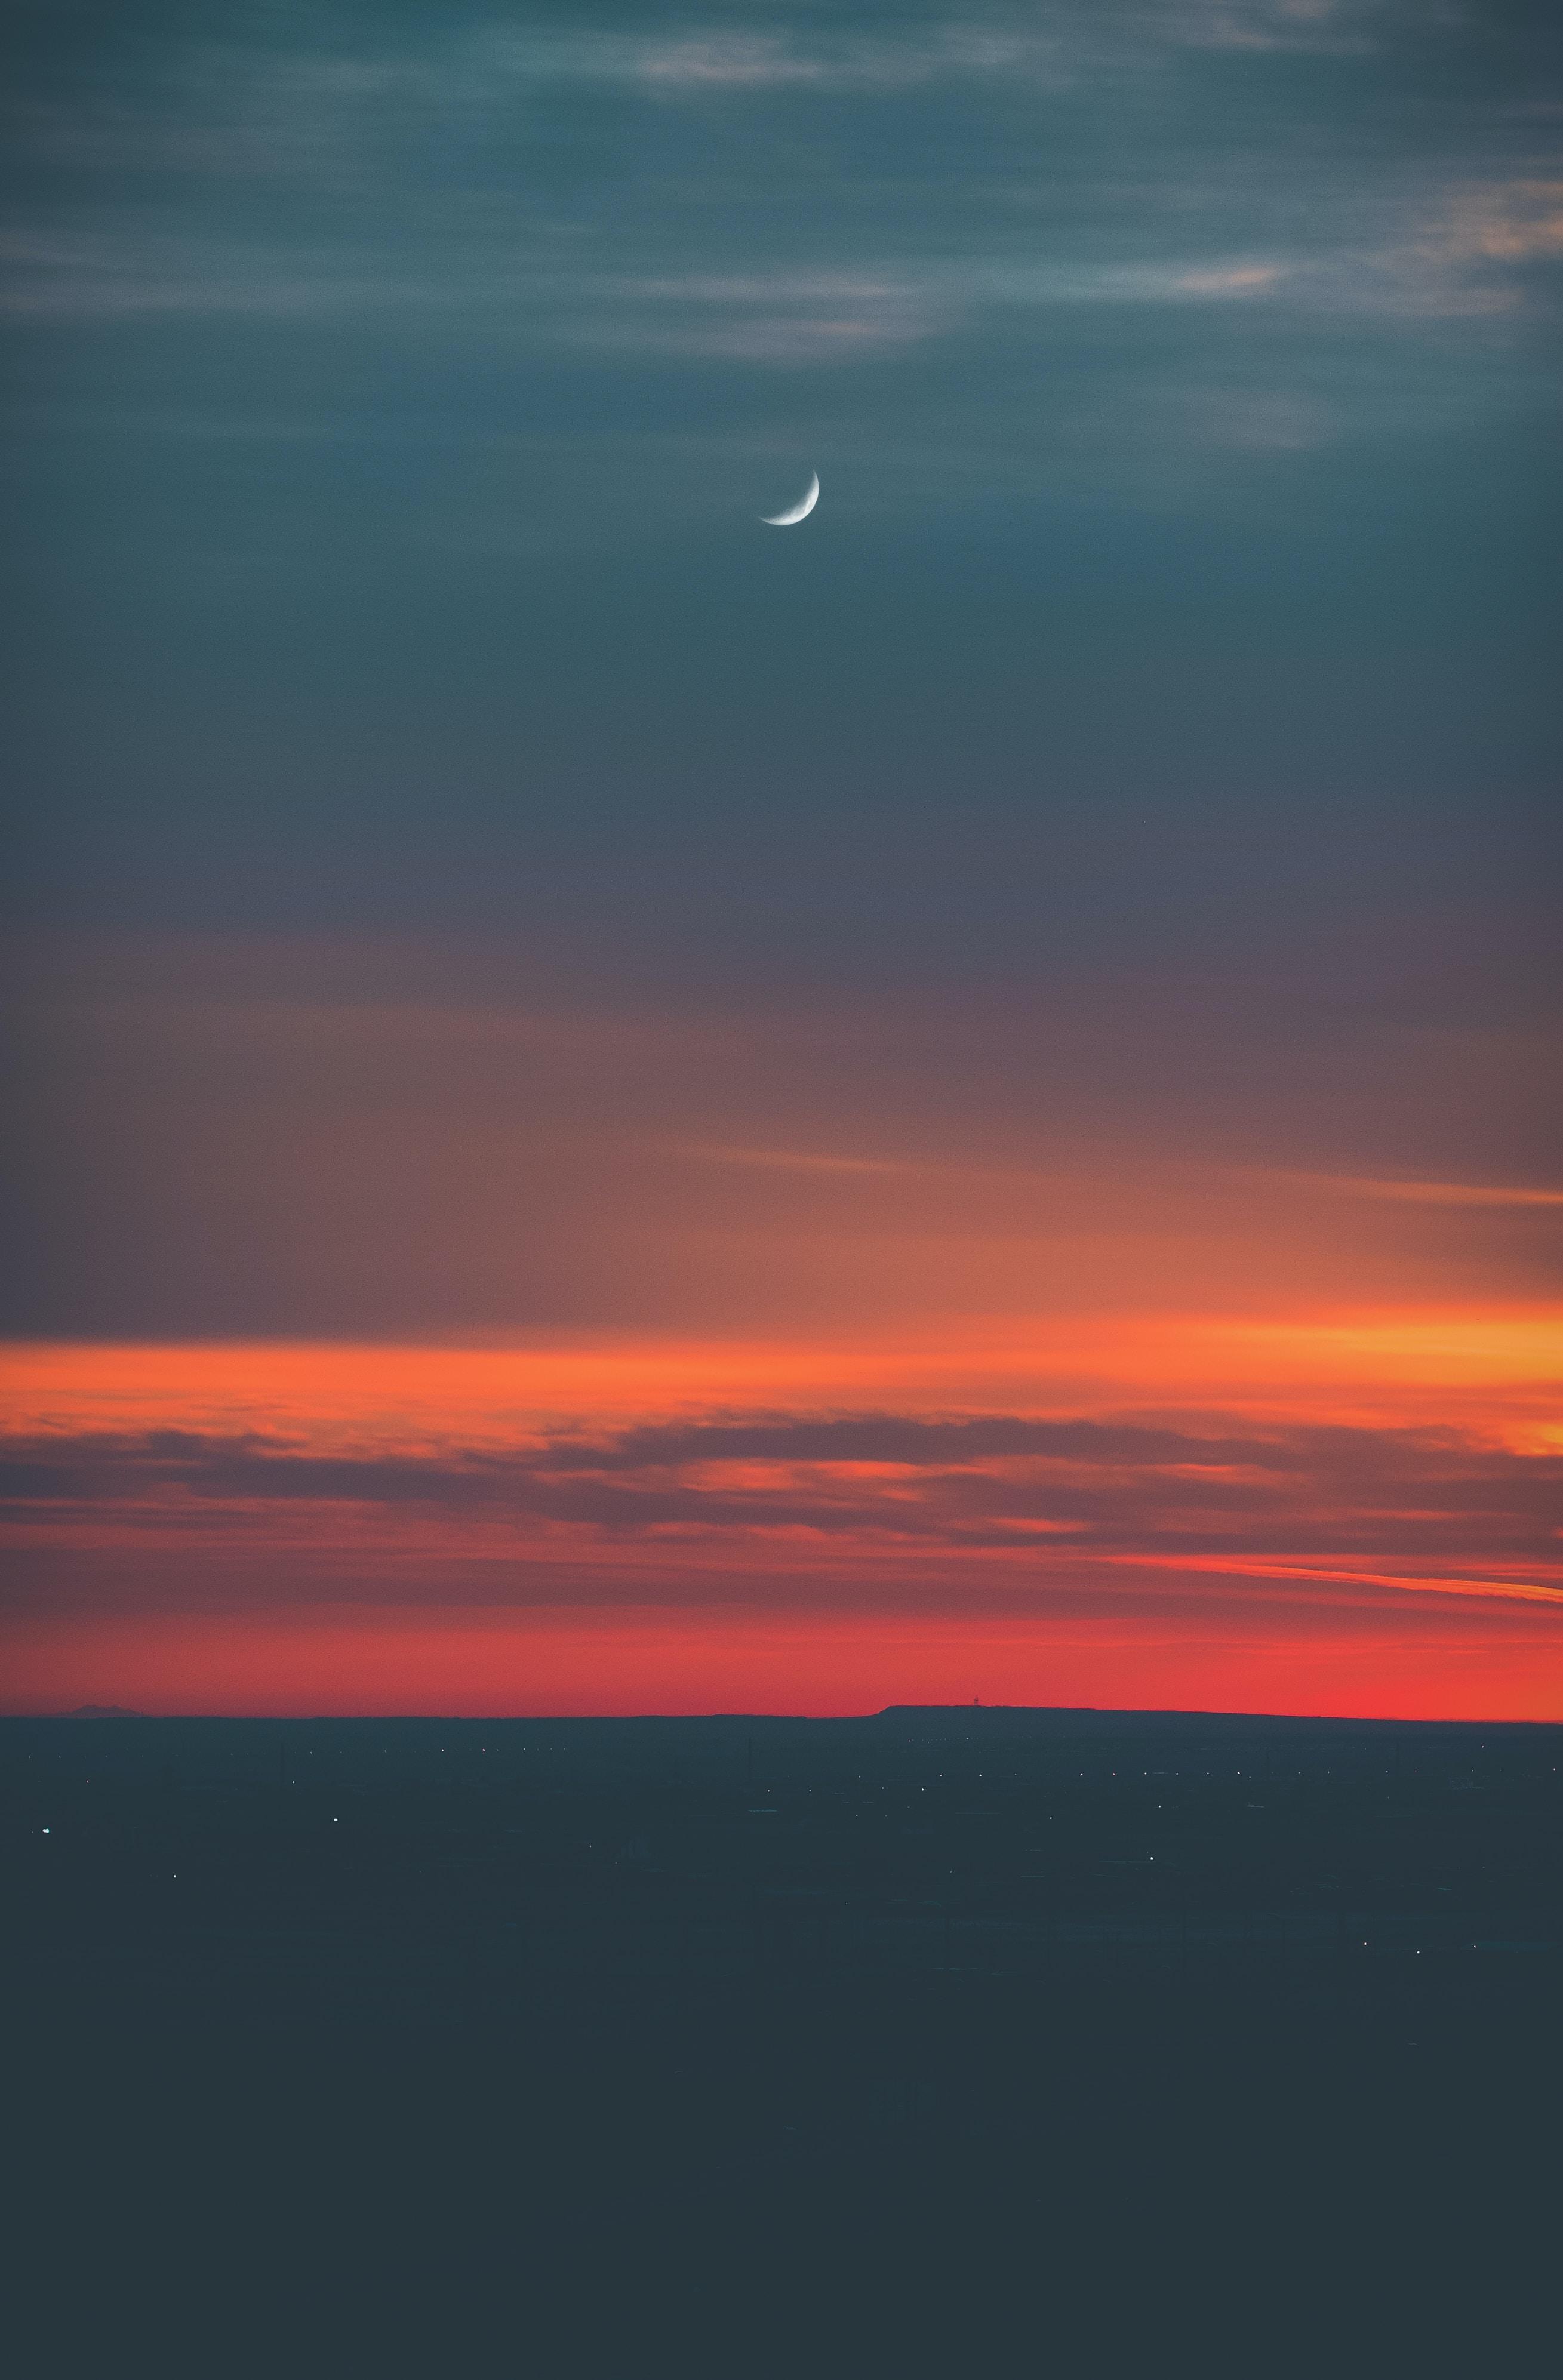 sea horizon during golden hour time